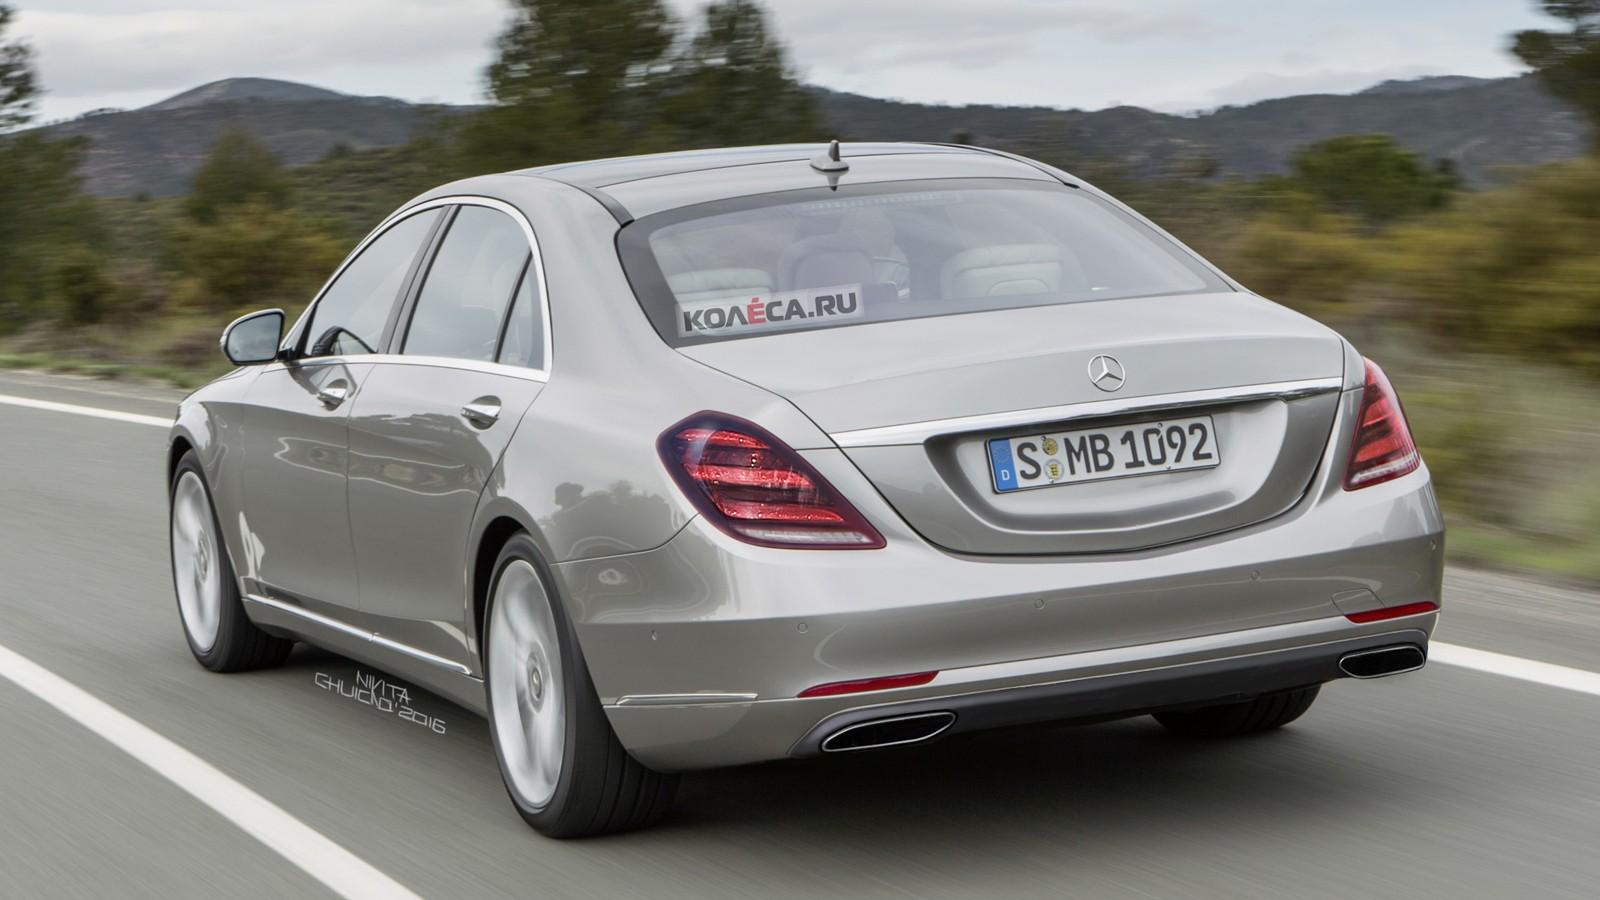 Mercedes-Benz S-klasse rear